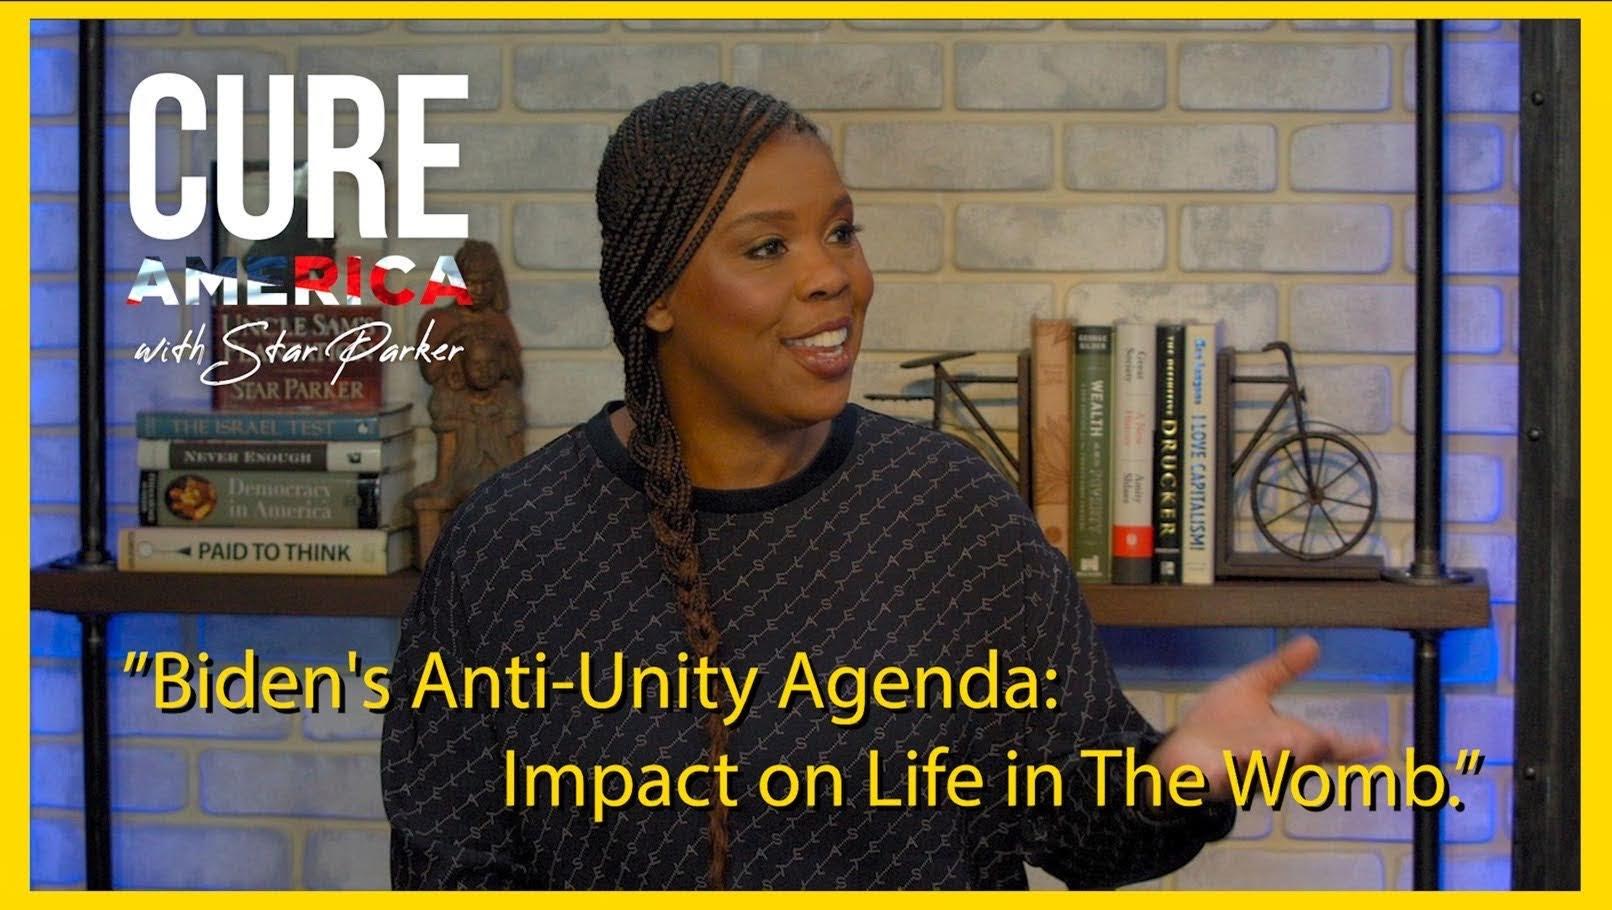 Biden's Anti-Unity Agenda: Impact on Life in the Womb